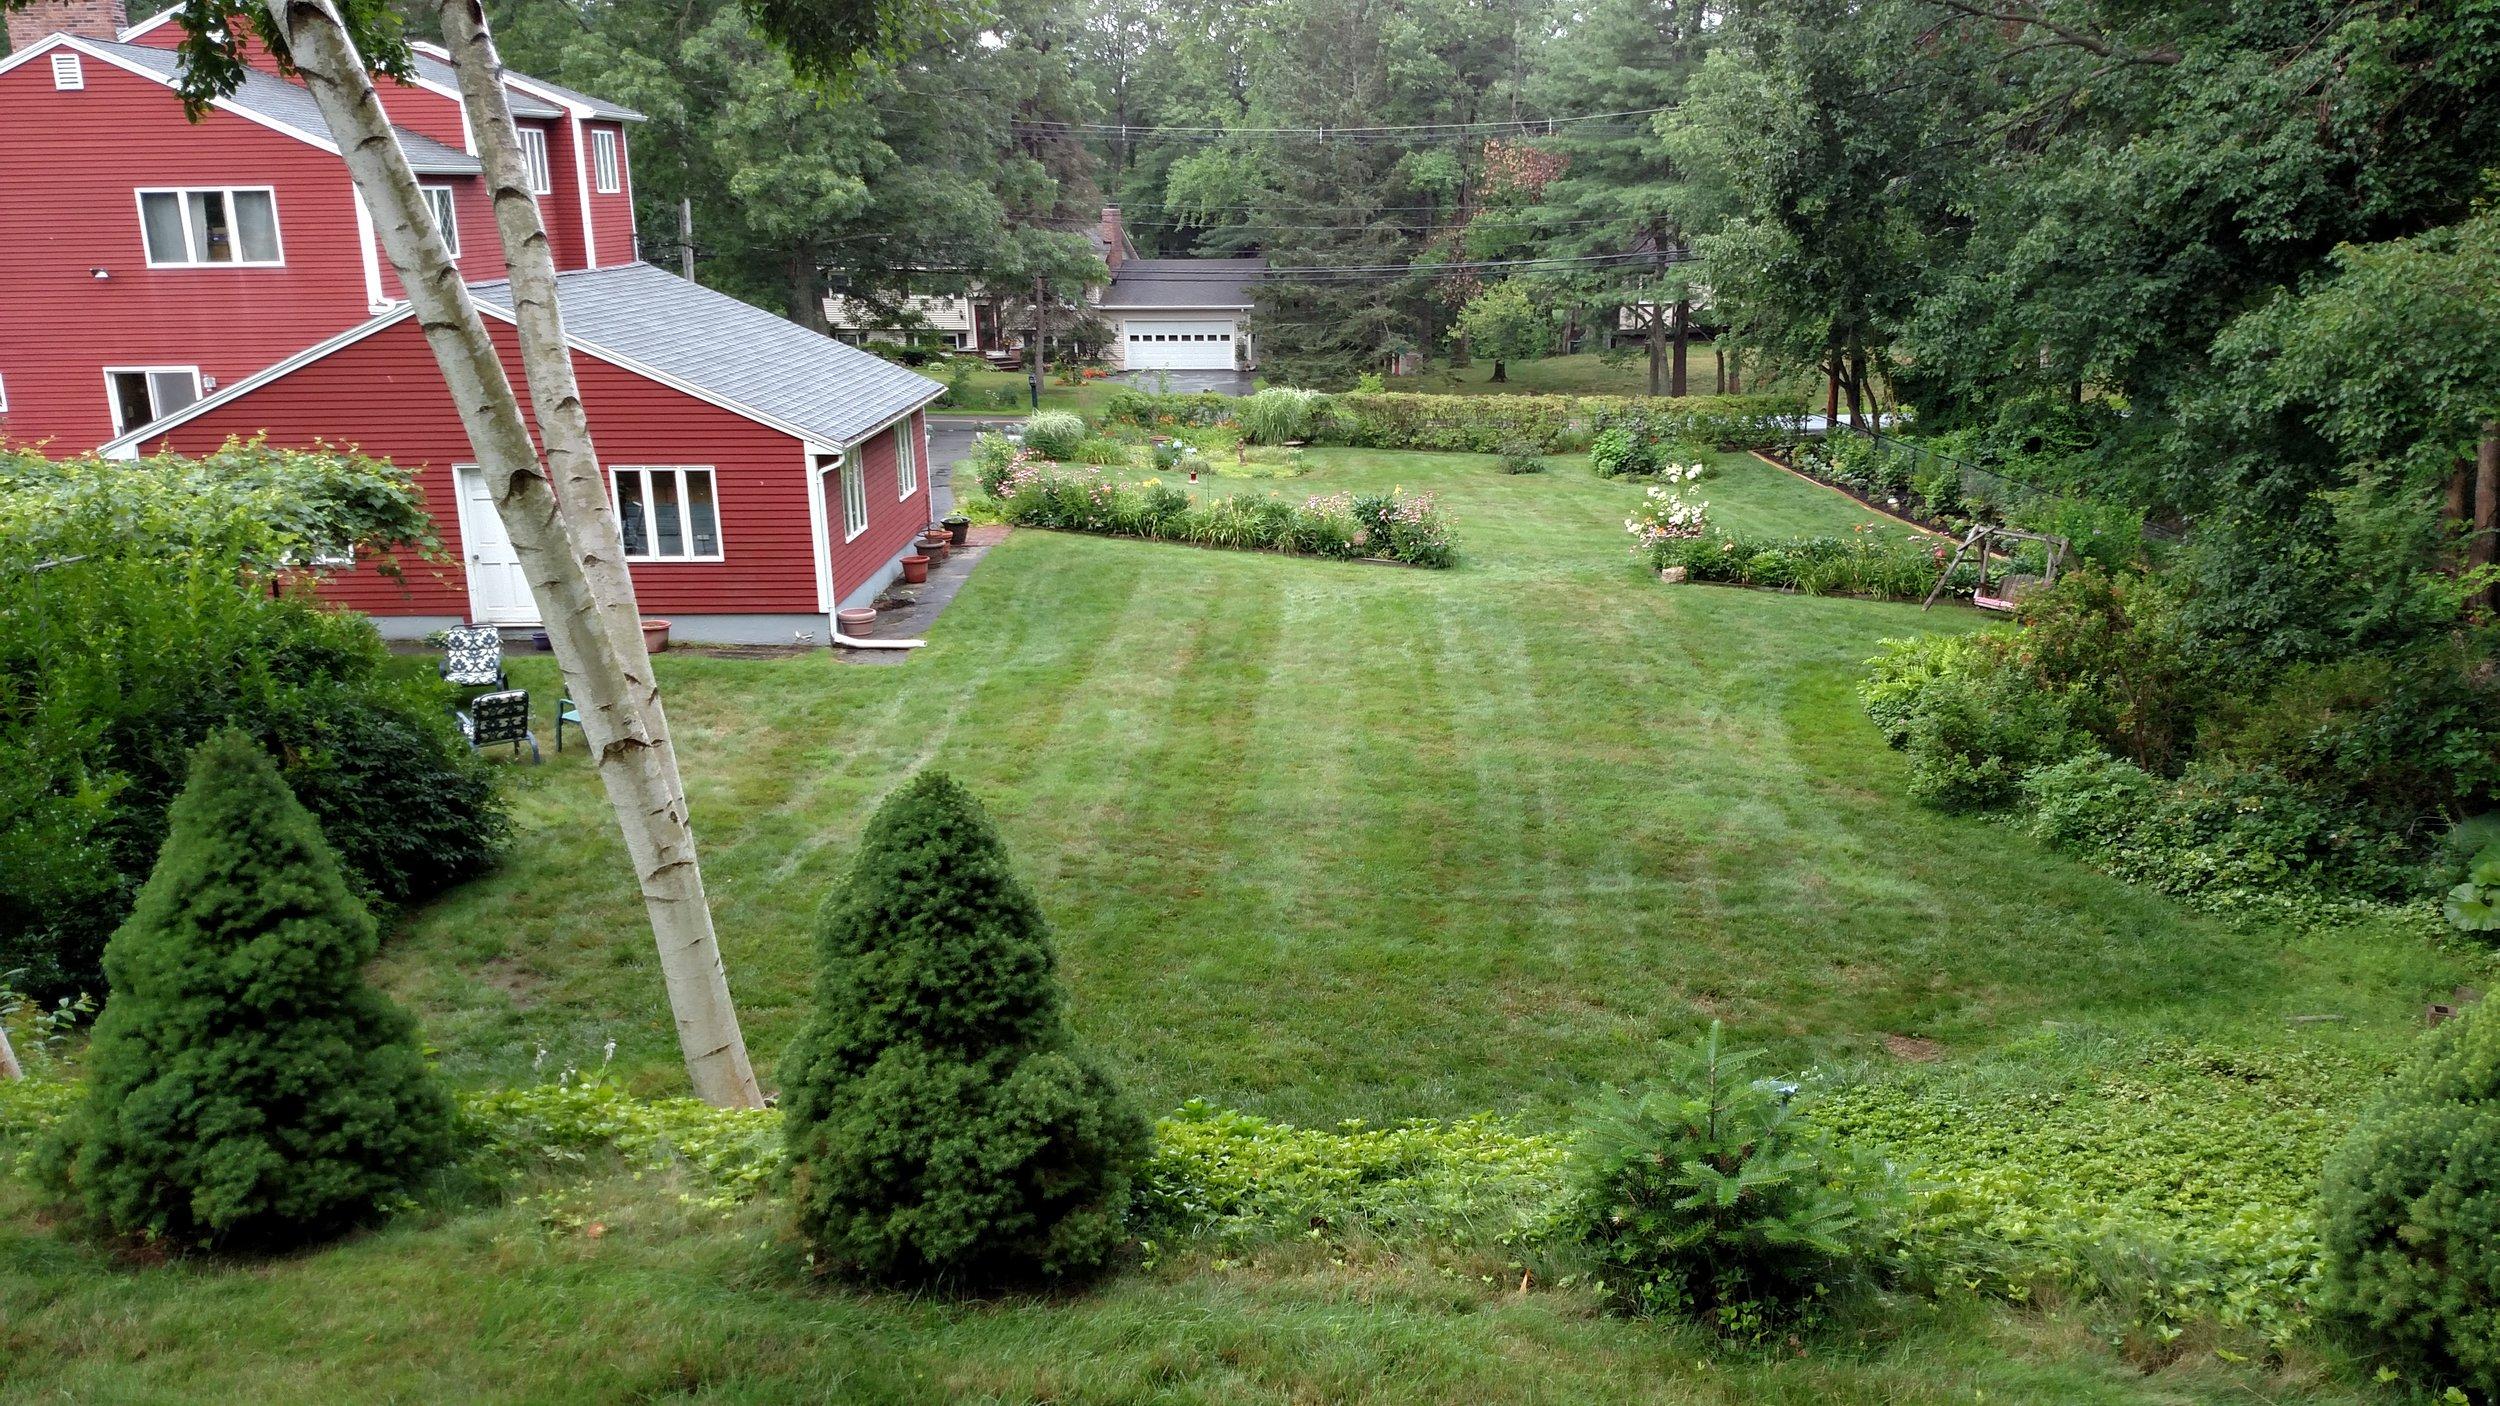 7-20-18 Shapiro Garden 20.jpg